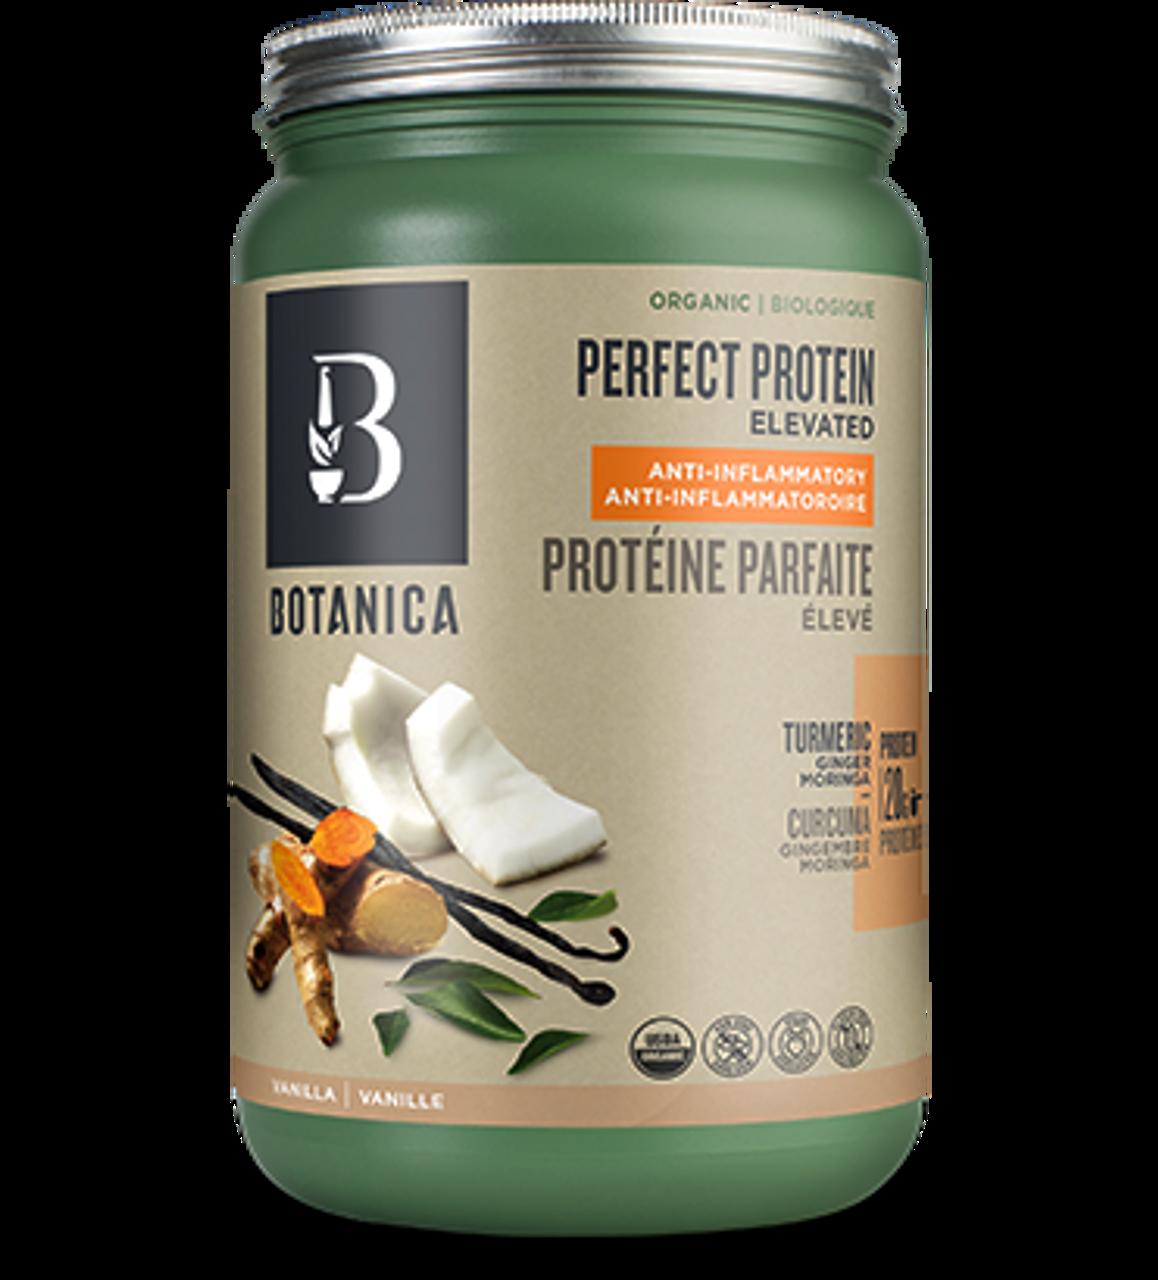 40b0472fb Botanica Perfect Protein Elevated Anti-Inflammatory Vanilla (629 g)